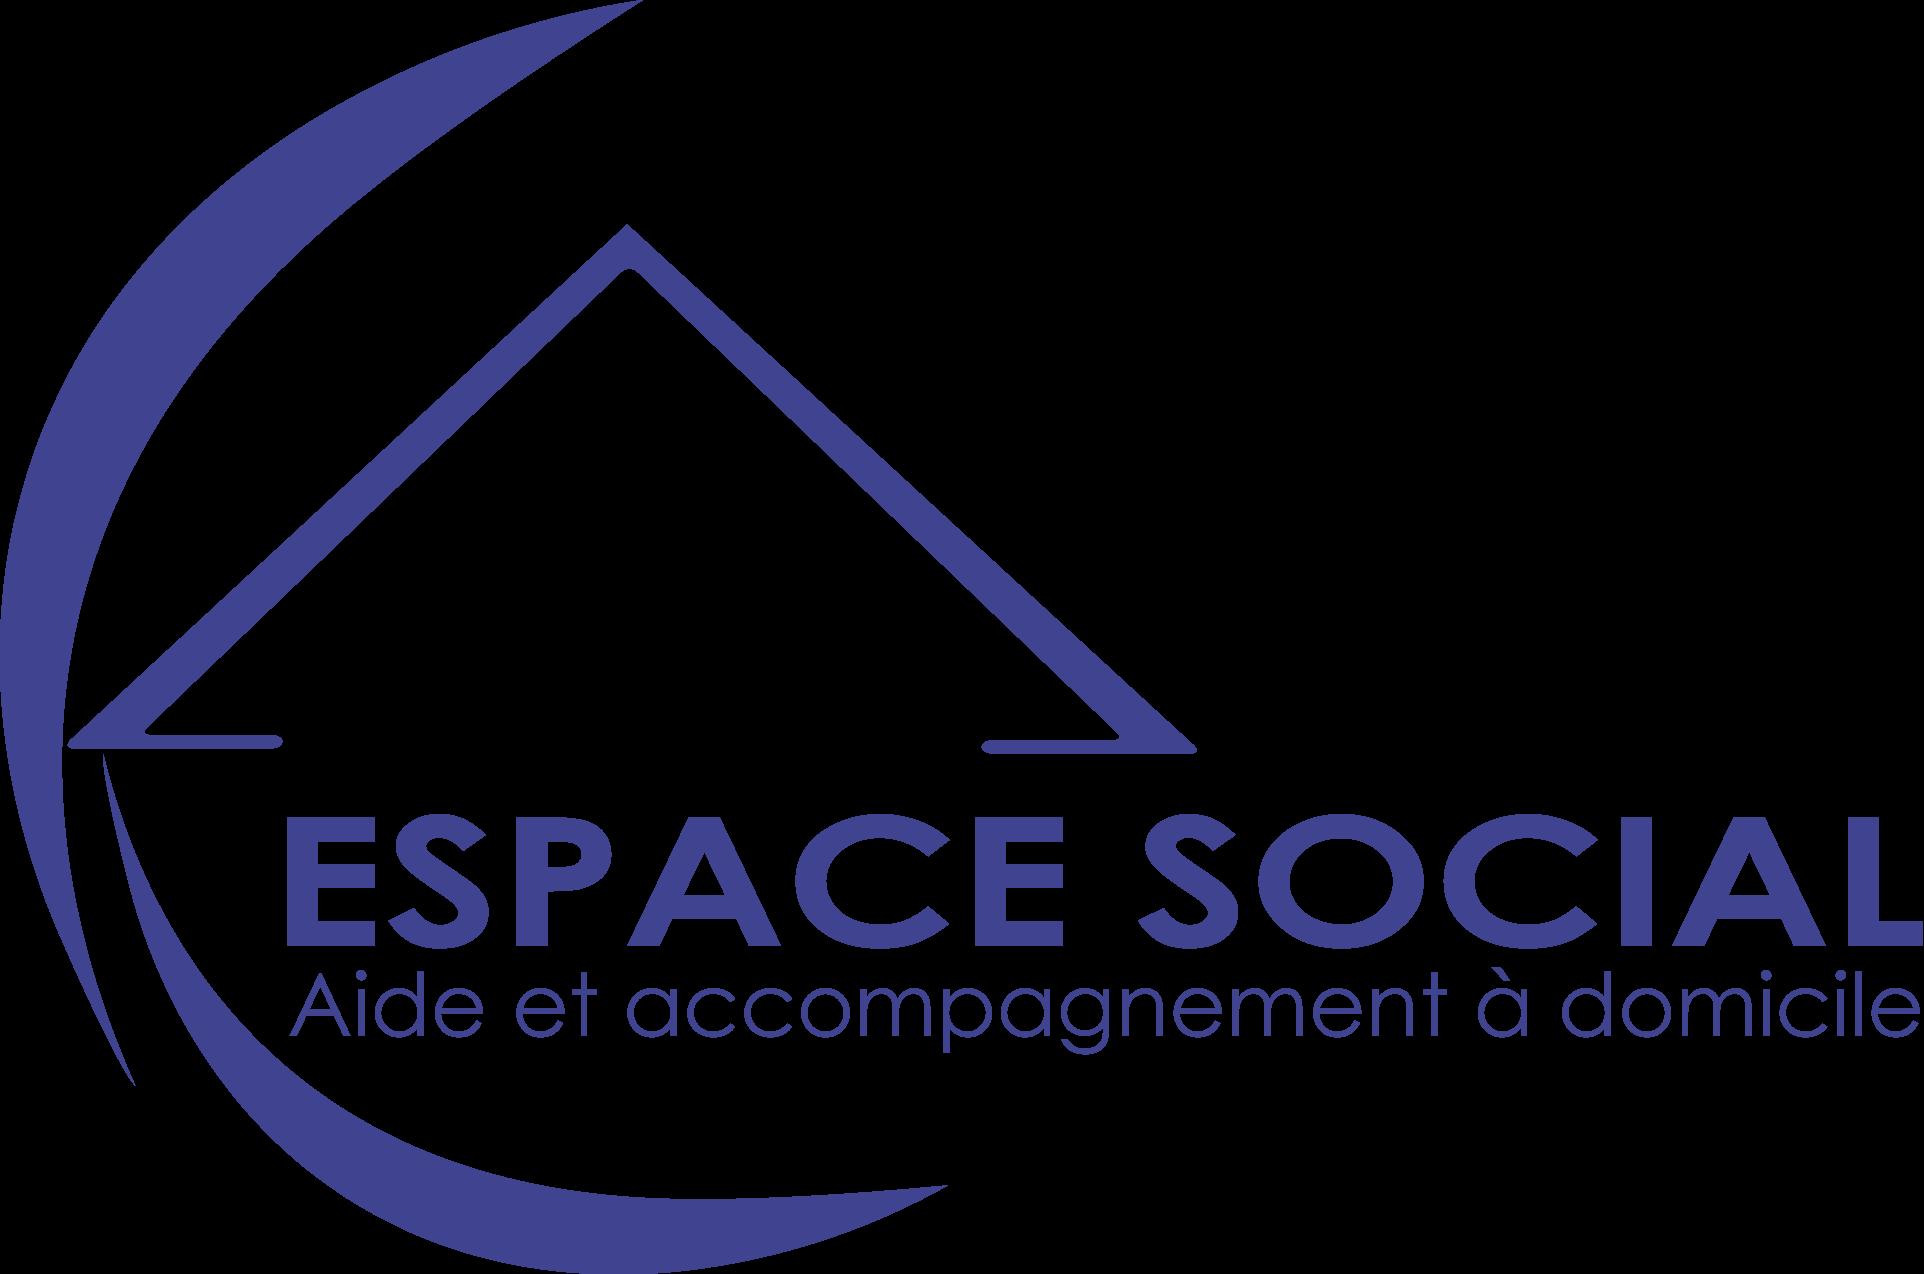 Espace Social I Accompagnement à domicile I 9 Nîmes I A domicile